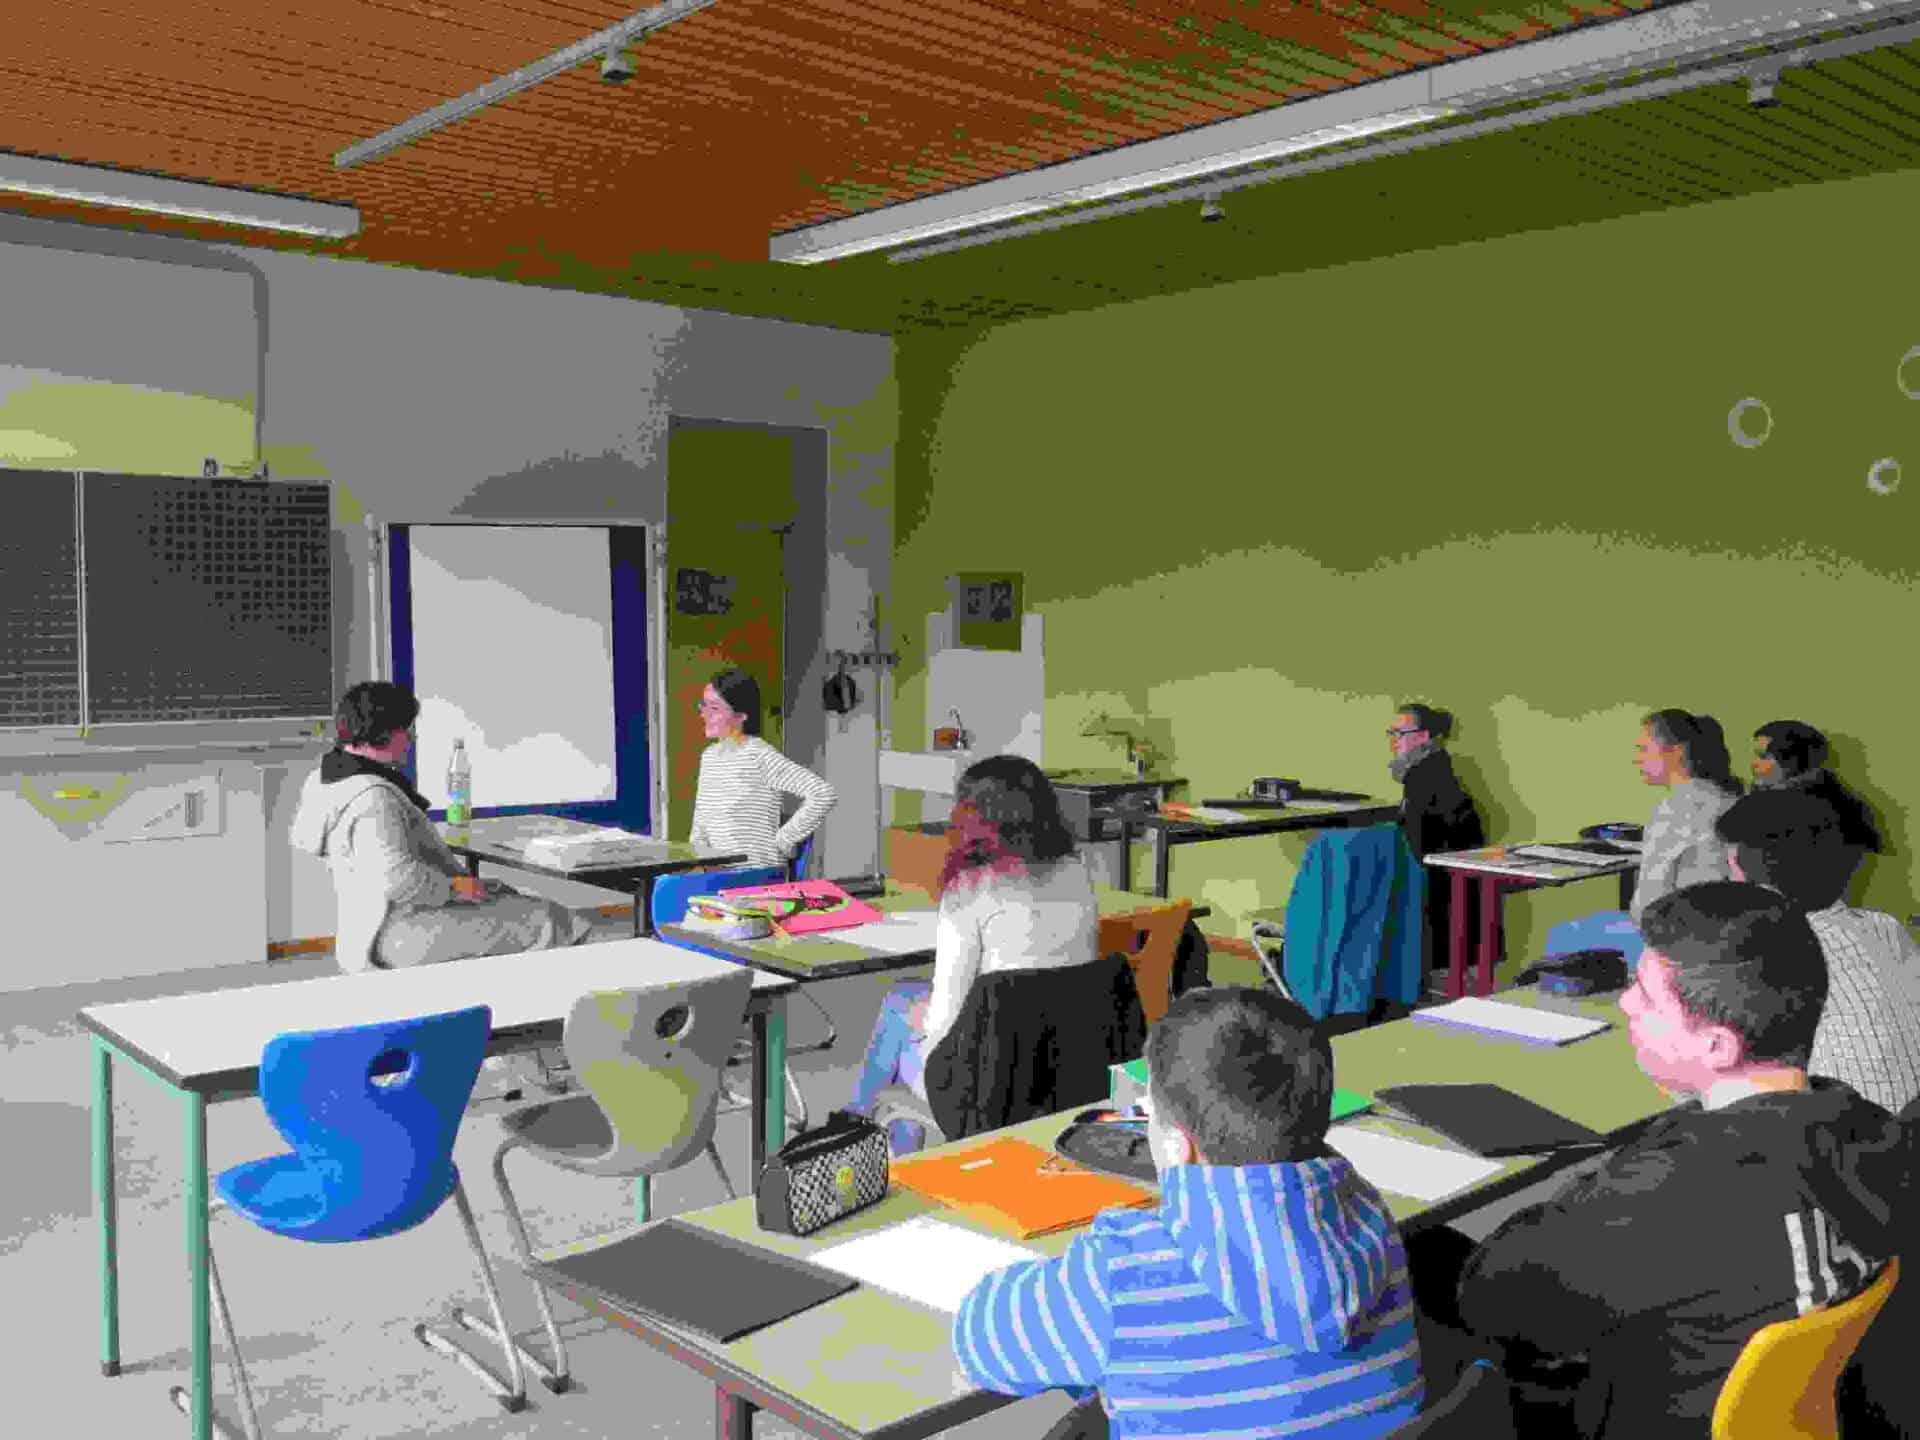 IMG 0571 - Bewerbungstraining bei der Werkrealschule Urphar-Lindelbach